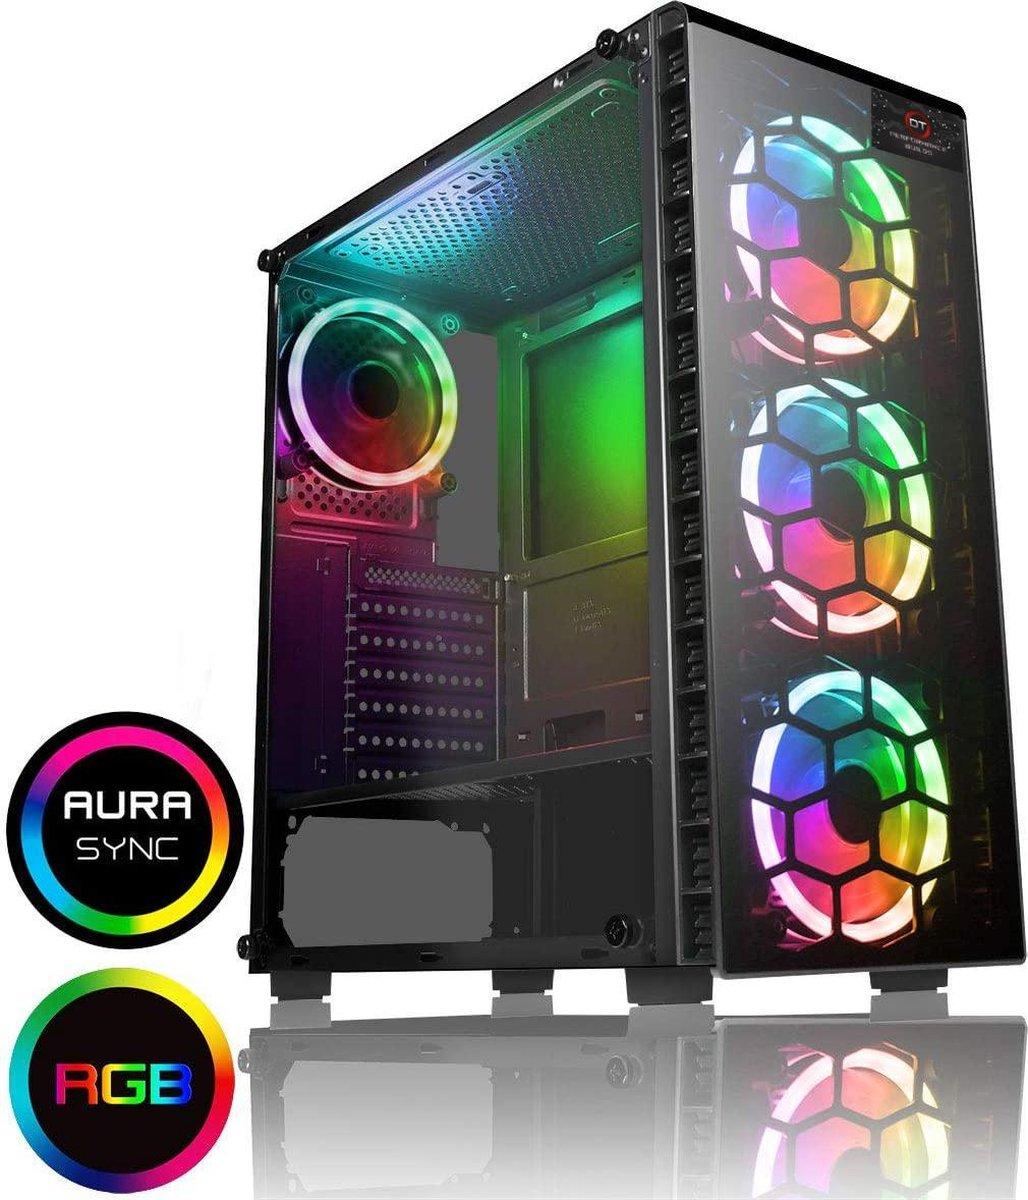 Ultra High-End GAME PC RGB – Intel Core i5 4,5 Ghz – RTX 3060 Ti – 16 GB DDR4 – 500GB NVME – 1 TB HDD – Draait alle games met gemak op High/Ultra!